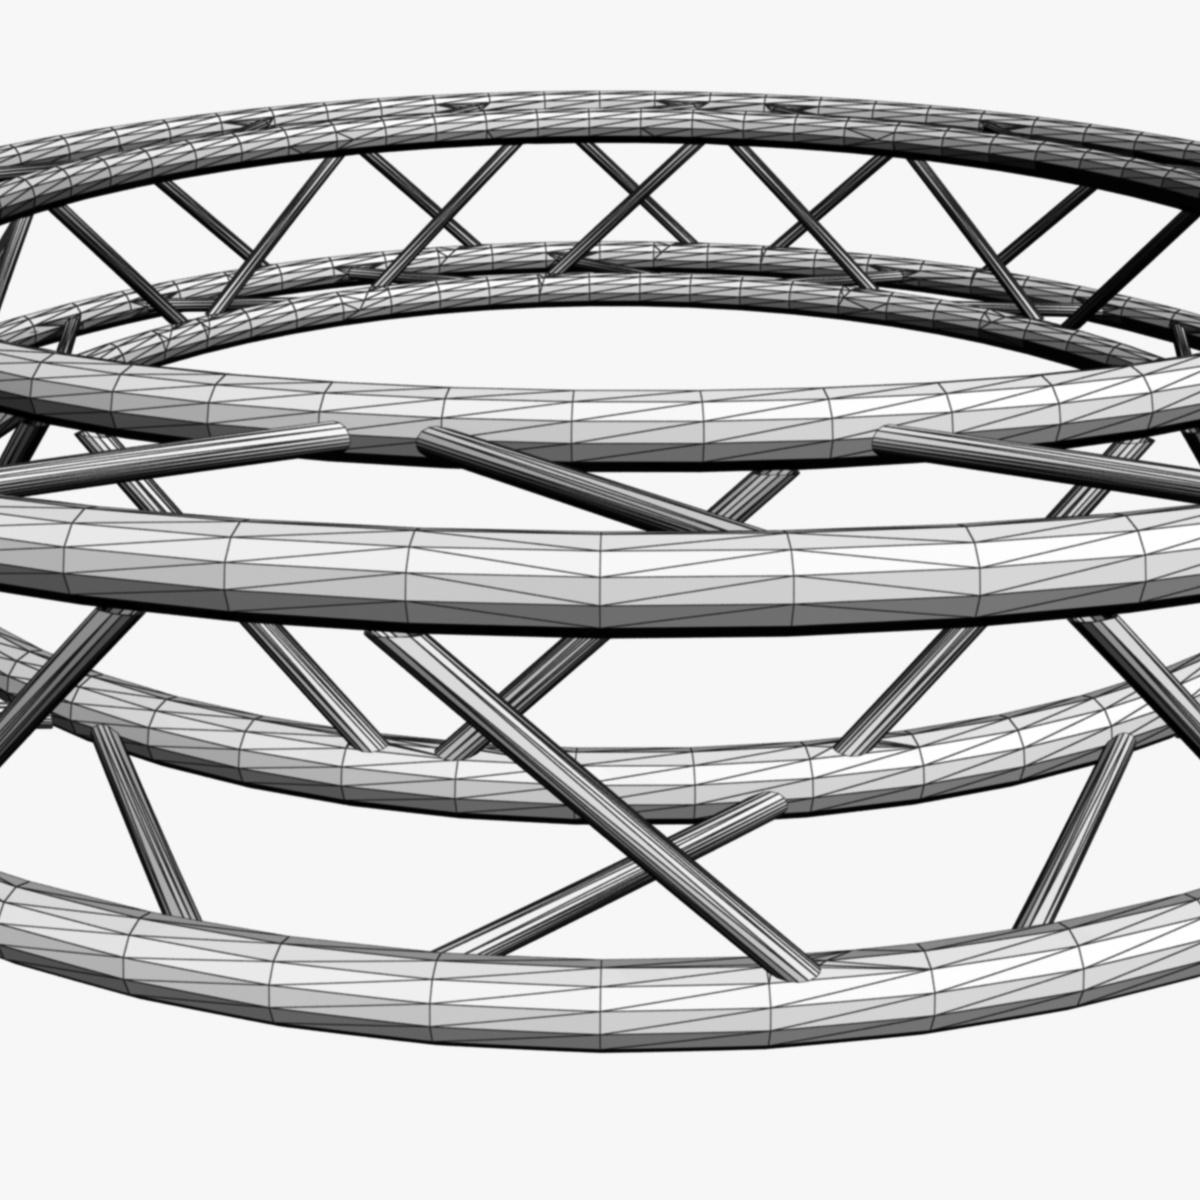 дугуй дөрвөлжин Дотоод (бүрэн диаметр 200cm) 3d загвар 3ds max dxf fbx c4d dae obj 252370